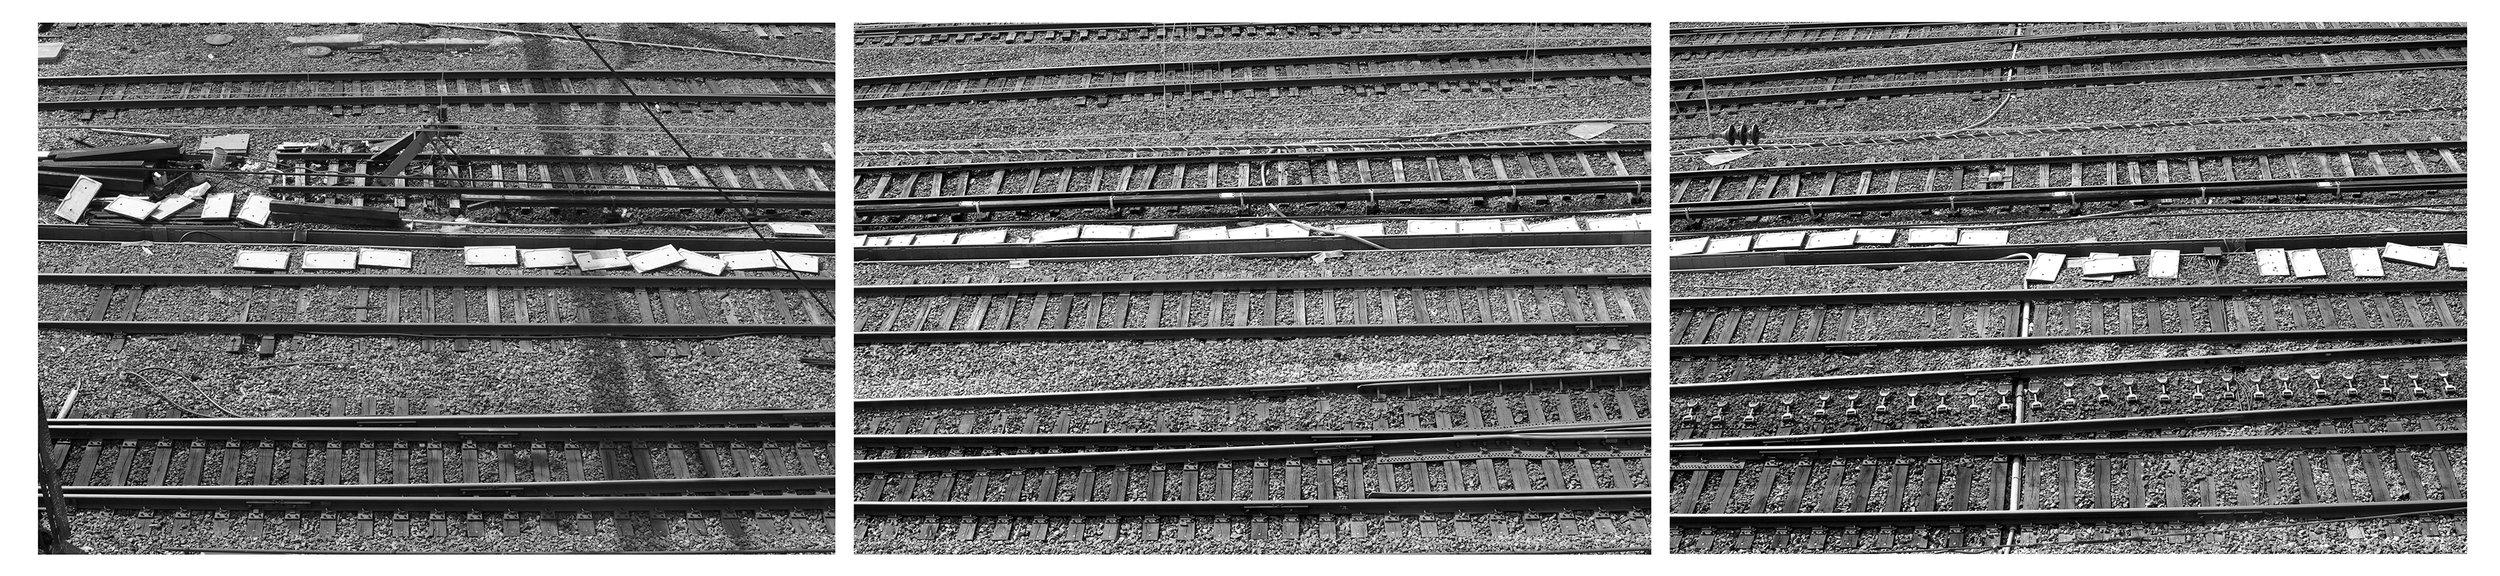 Triptych_Railyard_1.jpg